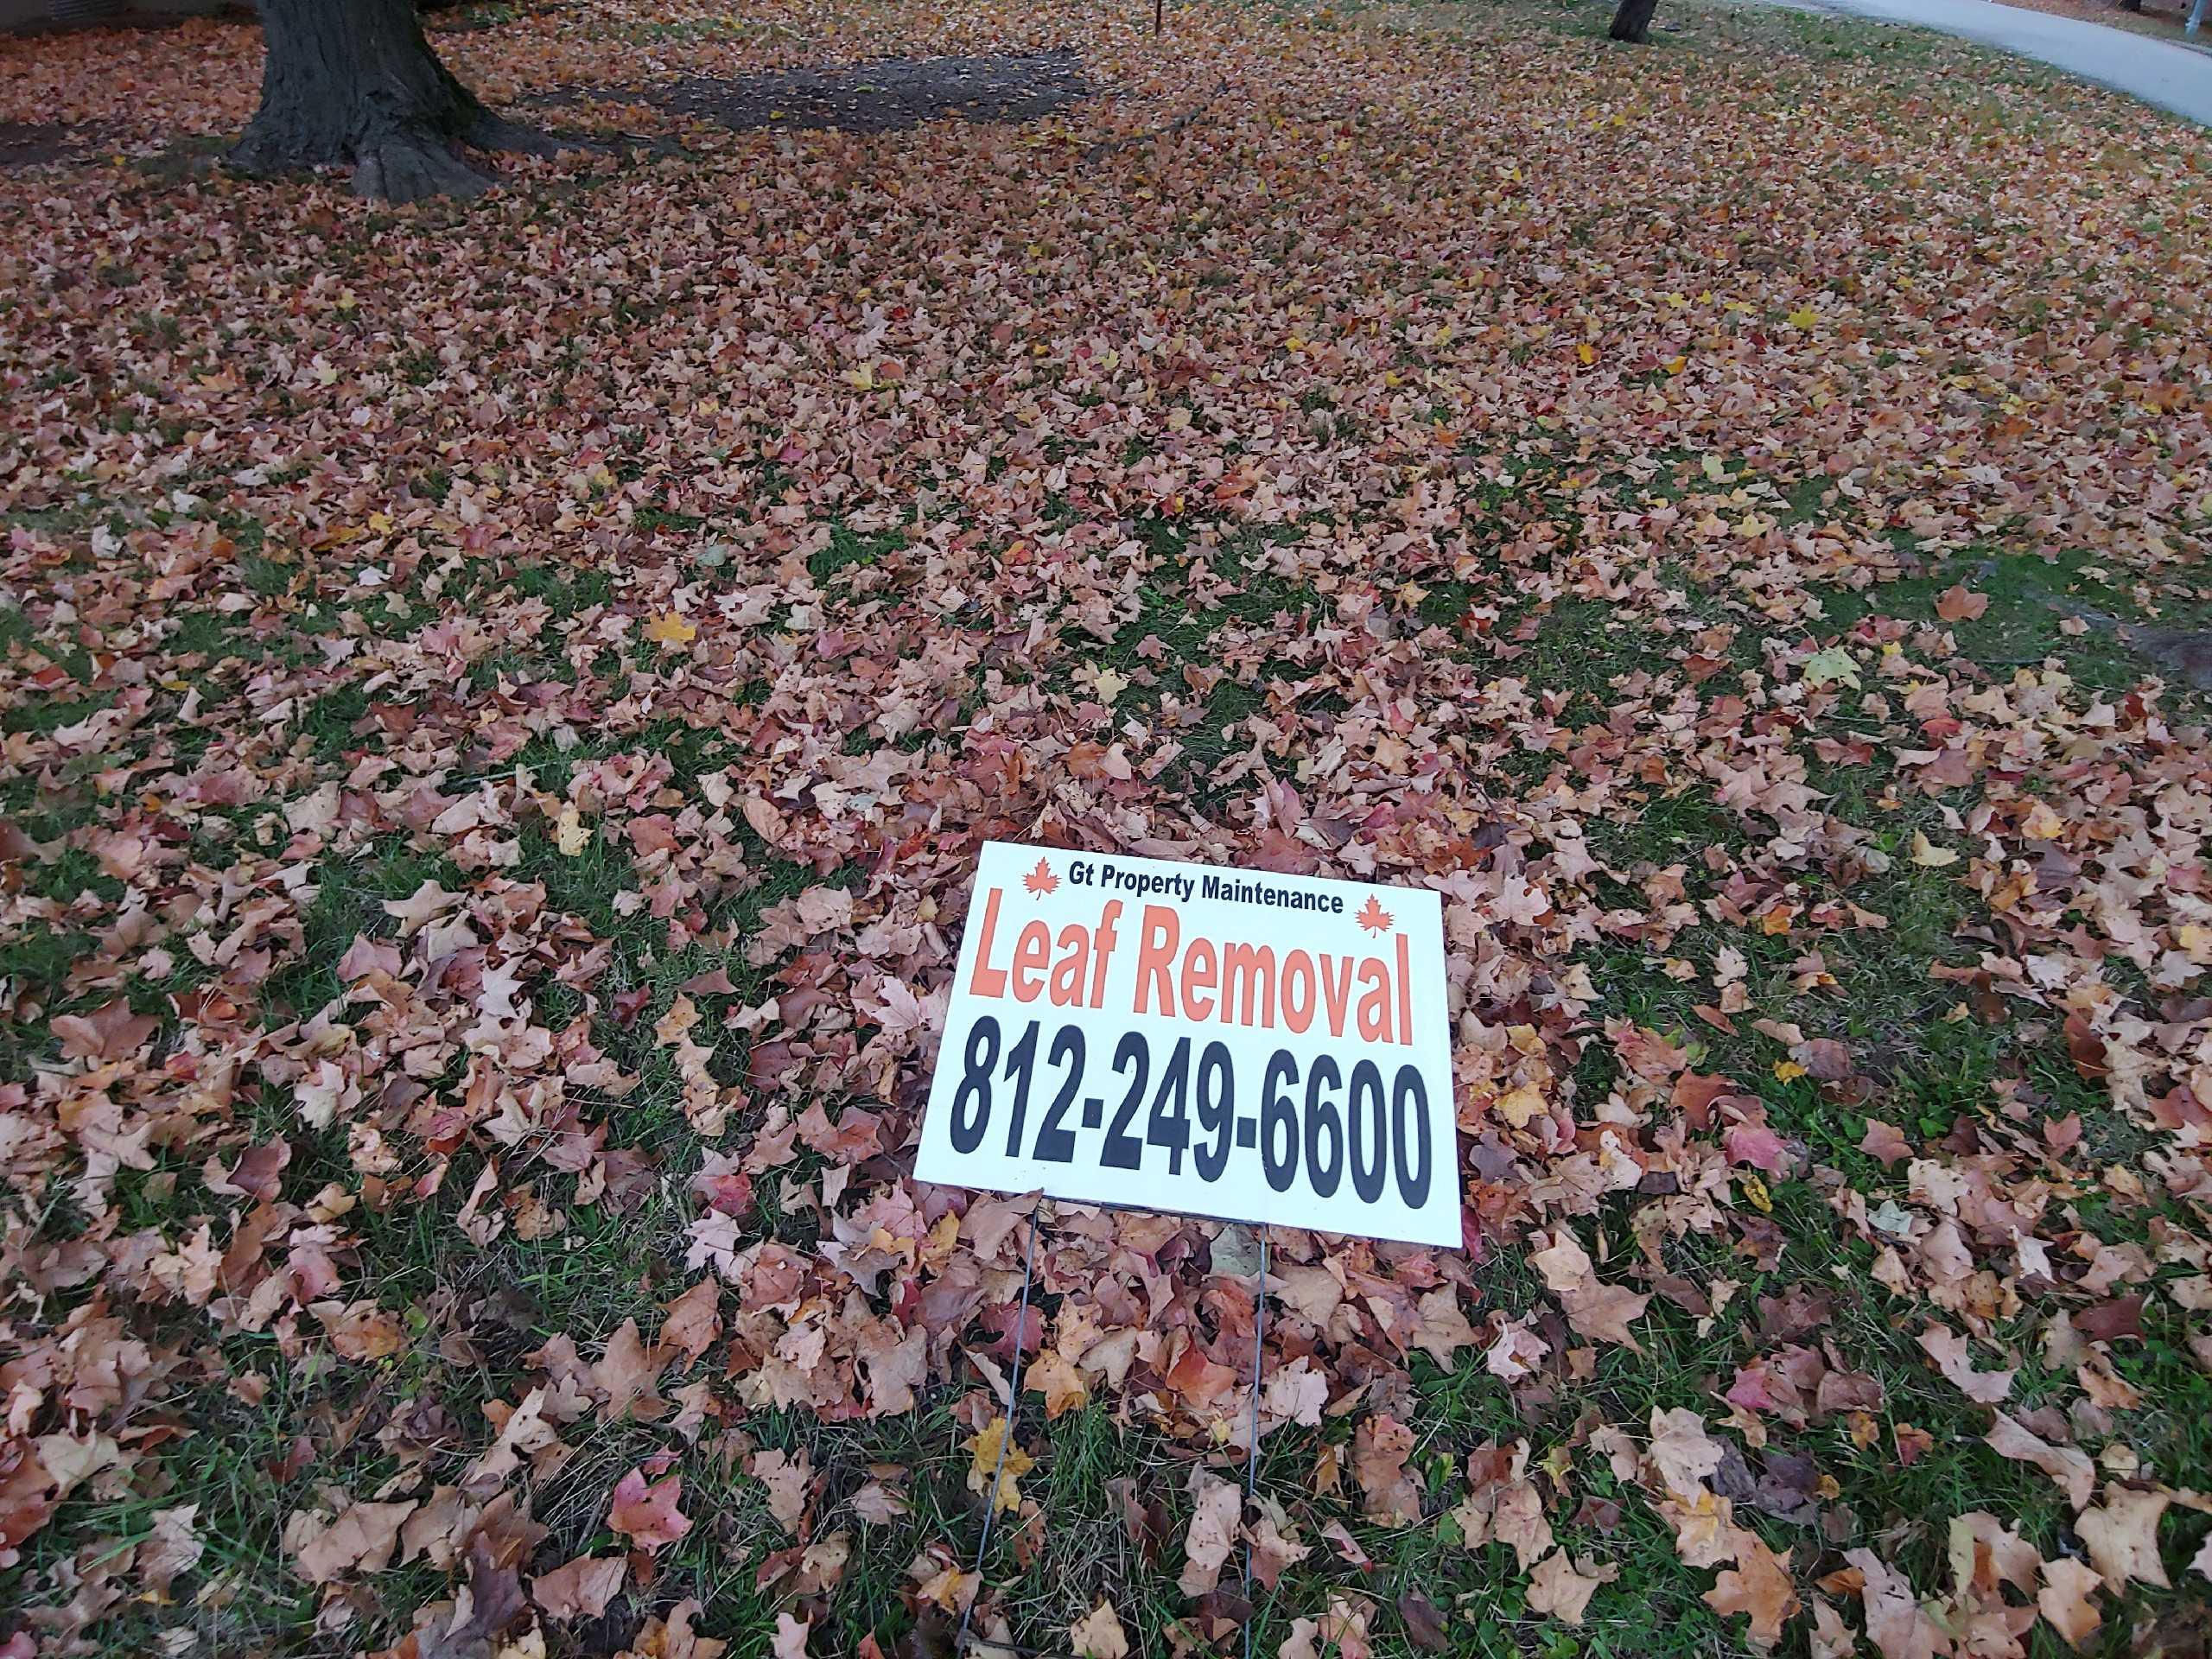 Grant leaf sign 1104191701b.jpg